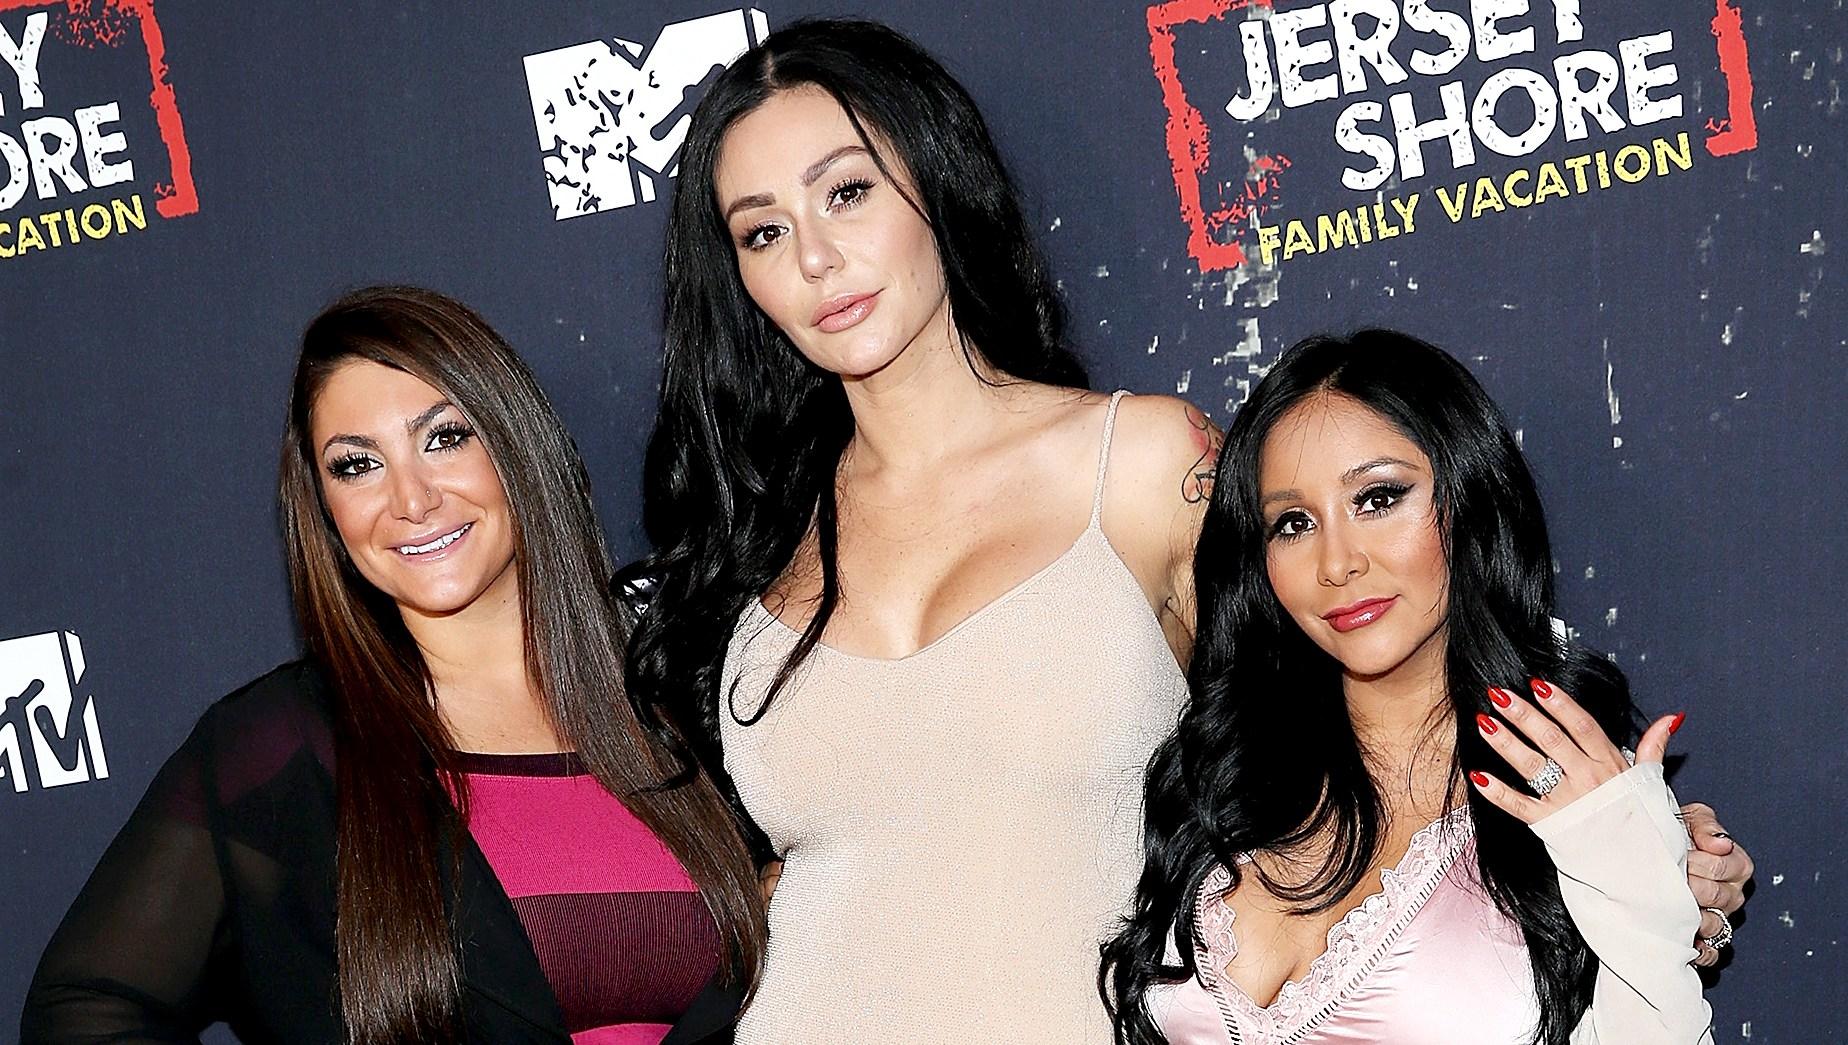 Deena-Cortese,-Jenni-'JWoww'-Farley,-and-Nicole-'Snooki'-Polizzi